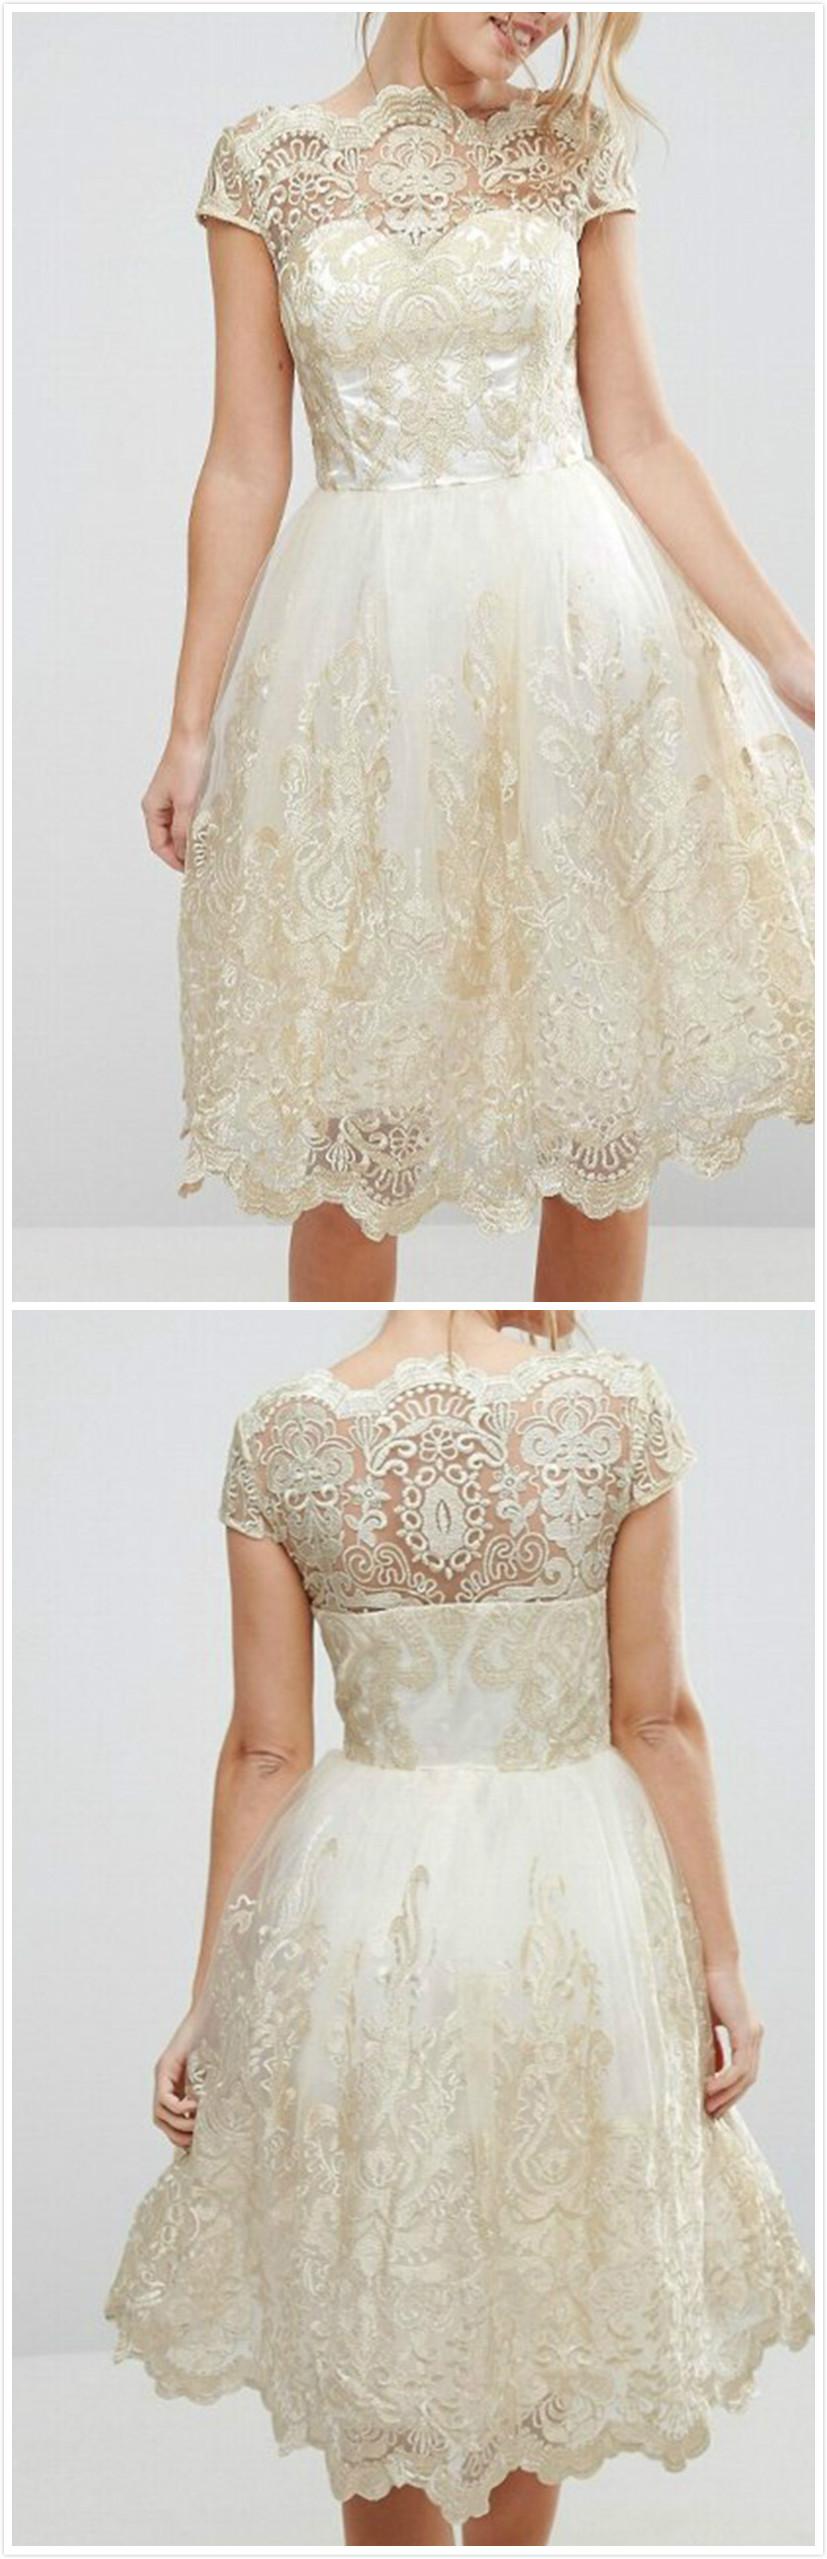 Women\'s Vintage Lace Net Yarn Embroidery Midi Dresses - NOVASHE.com